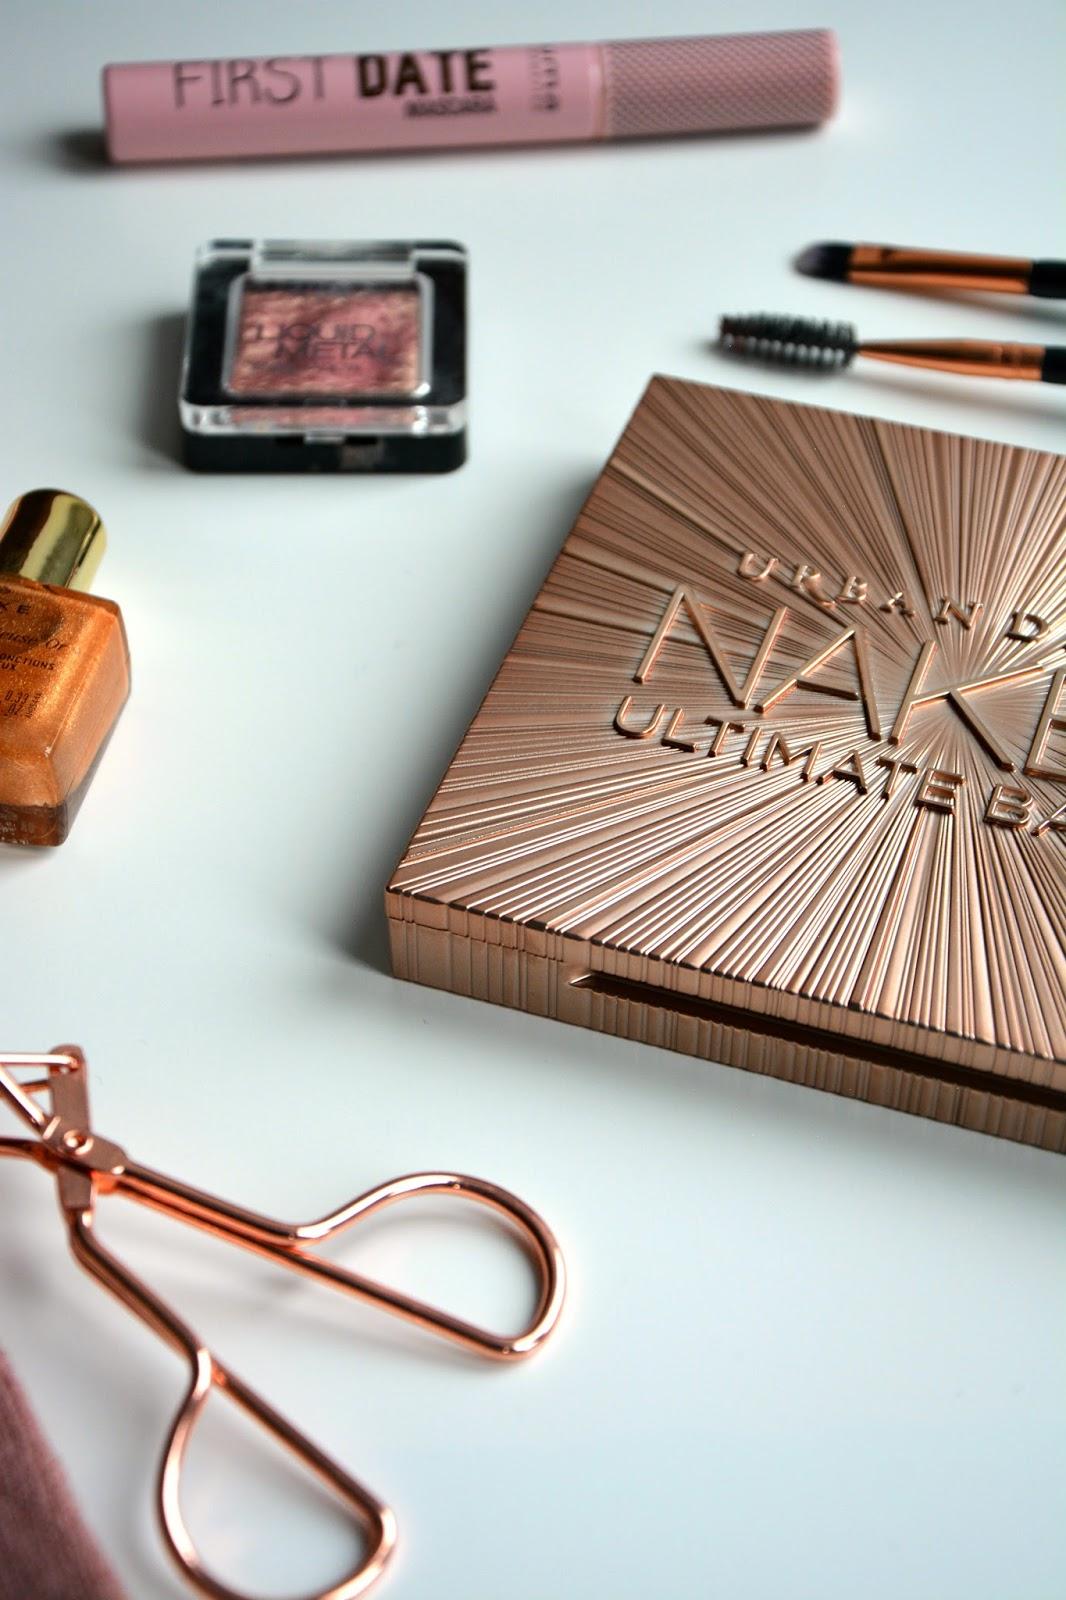 Urban Decay Naked Ultimate Basics, UMA First Date Mascara, Nuxe Body Oil, Catrice Metallic Eyeshadow, Primark utensils